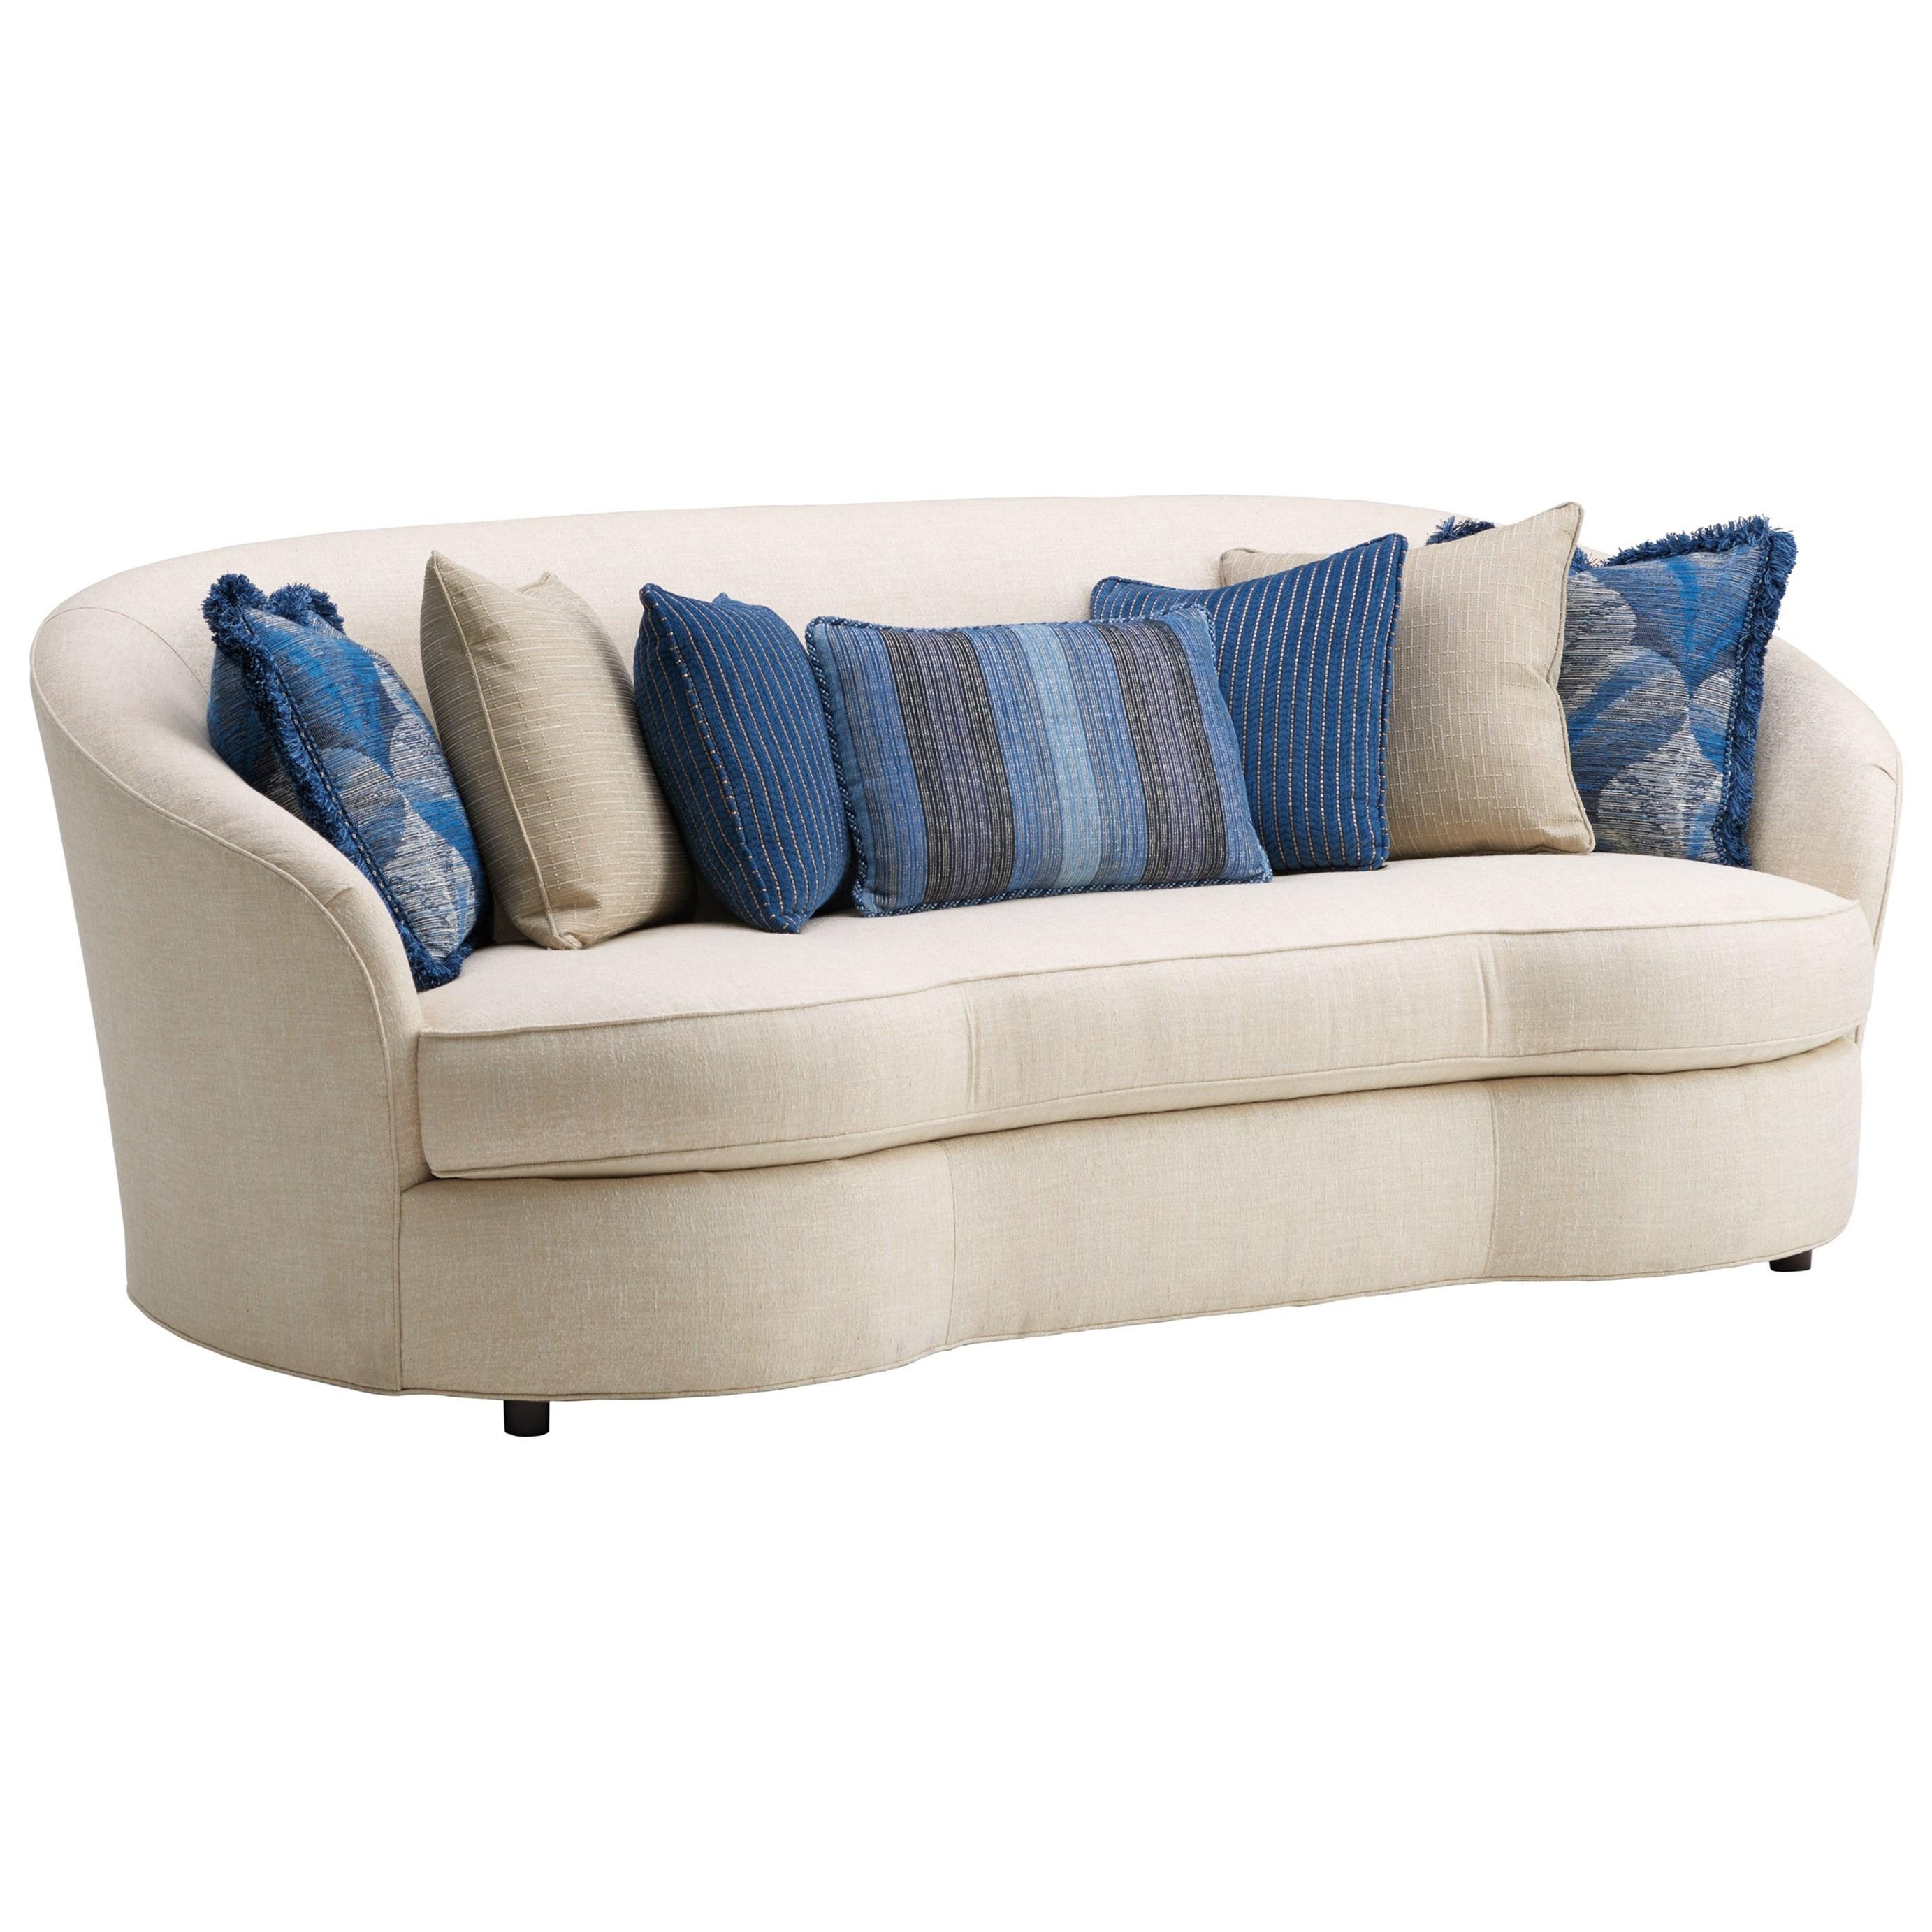 Carlyle Whitney Sofa by Lexington at Johnny Janosik